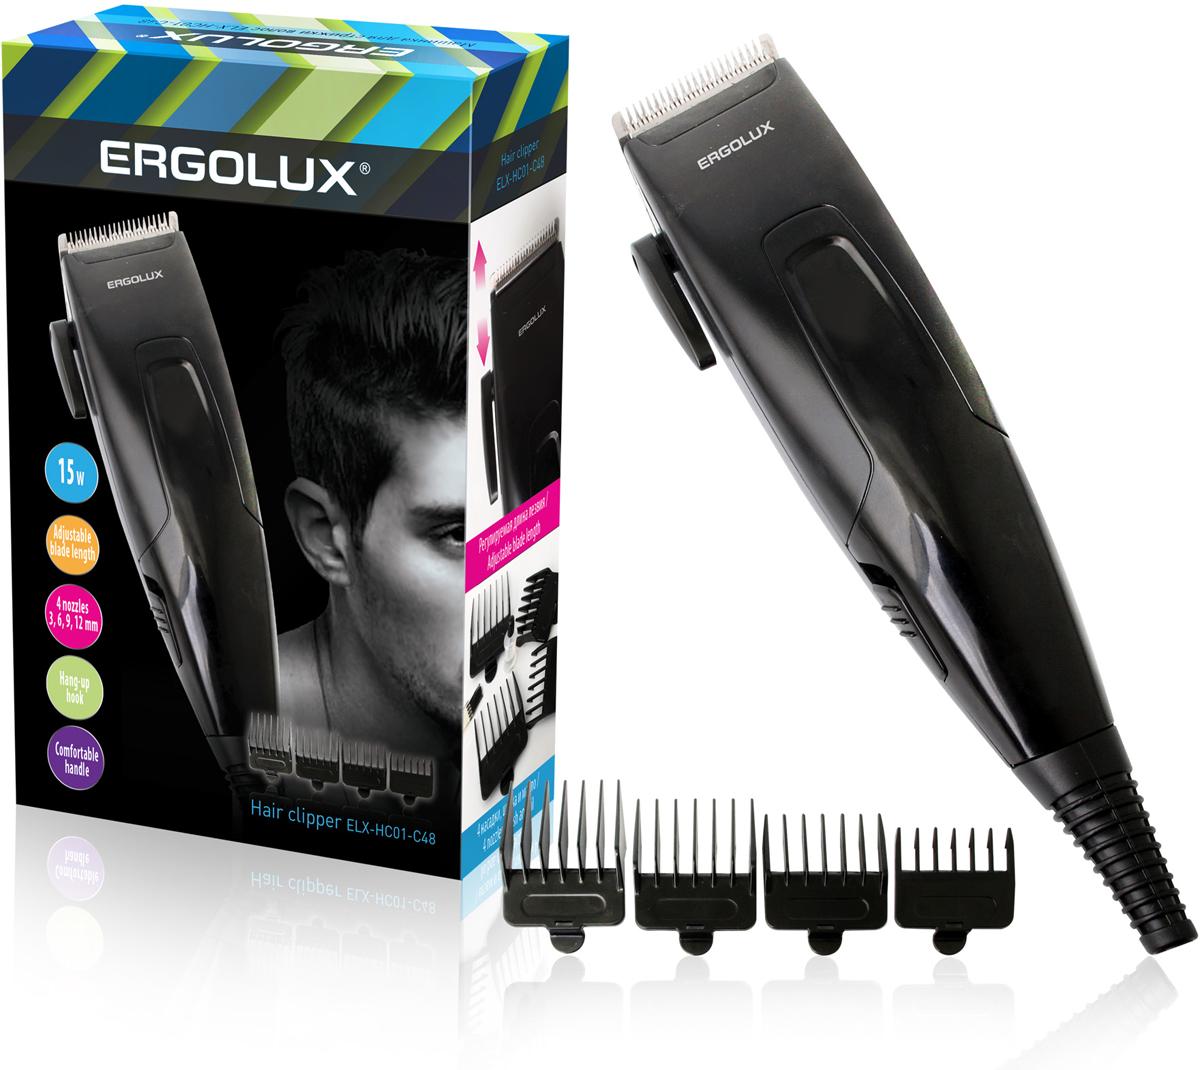 Ergolux ELX-HC01-C48, Black машинка для стрижки волос